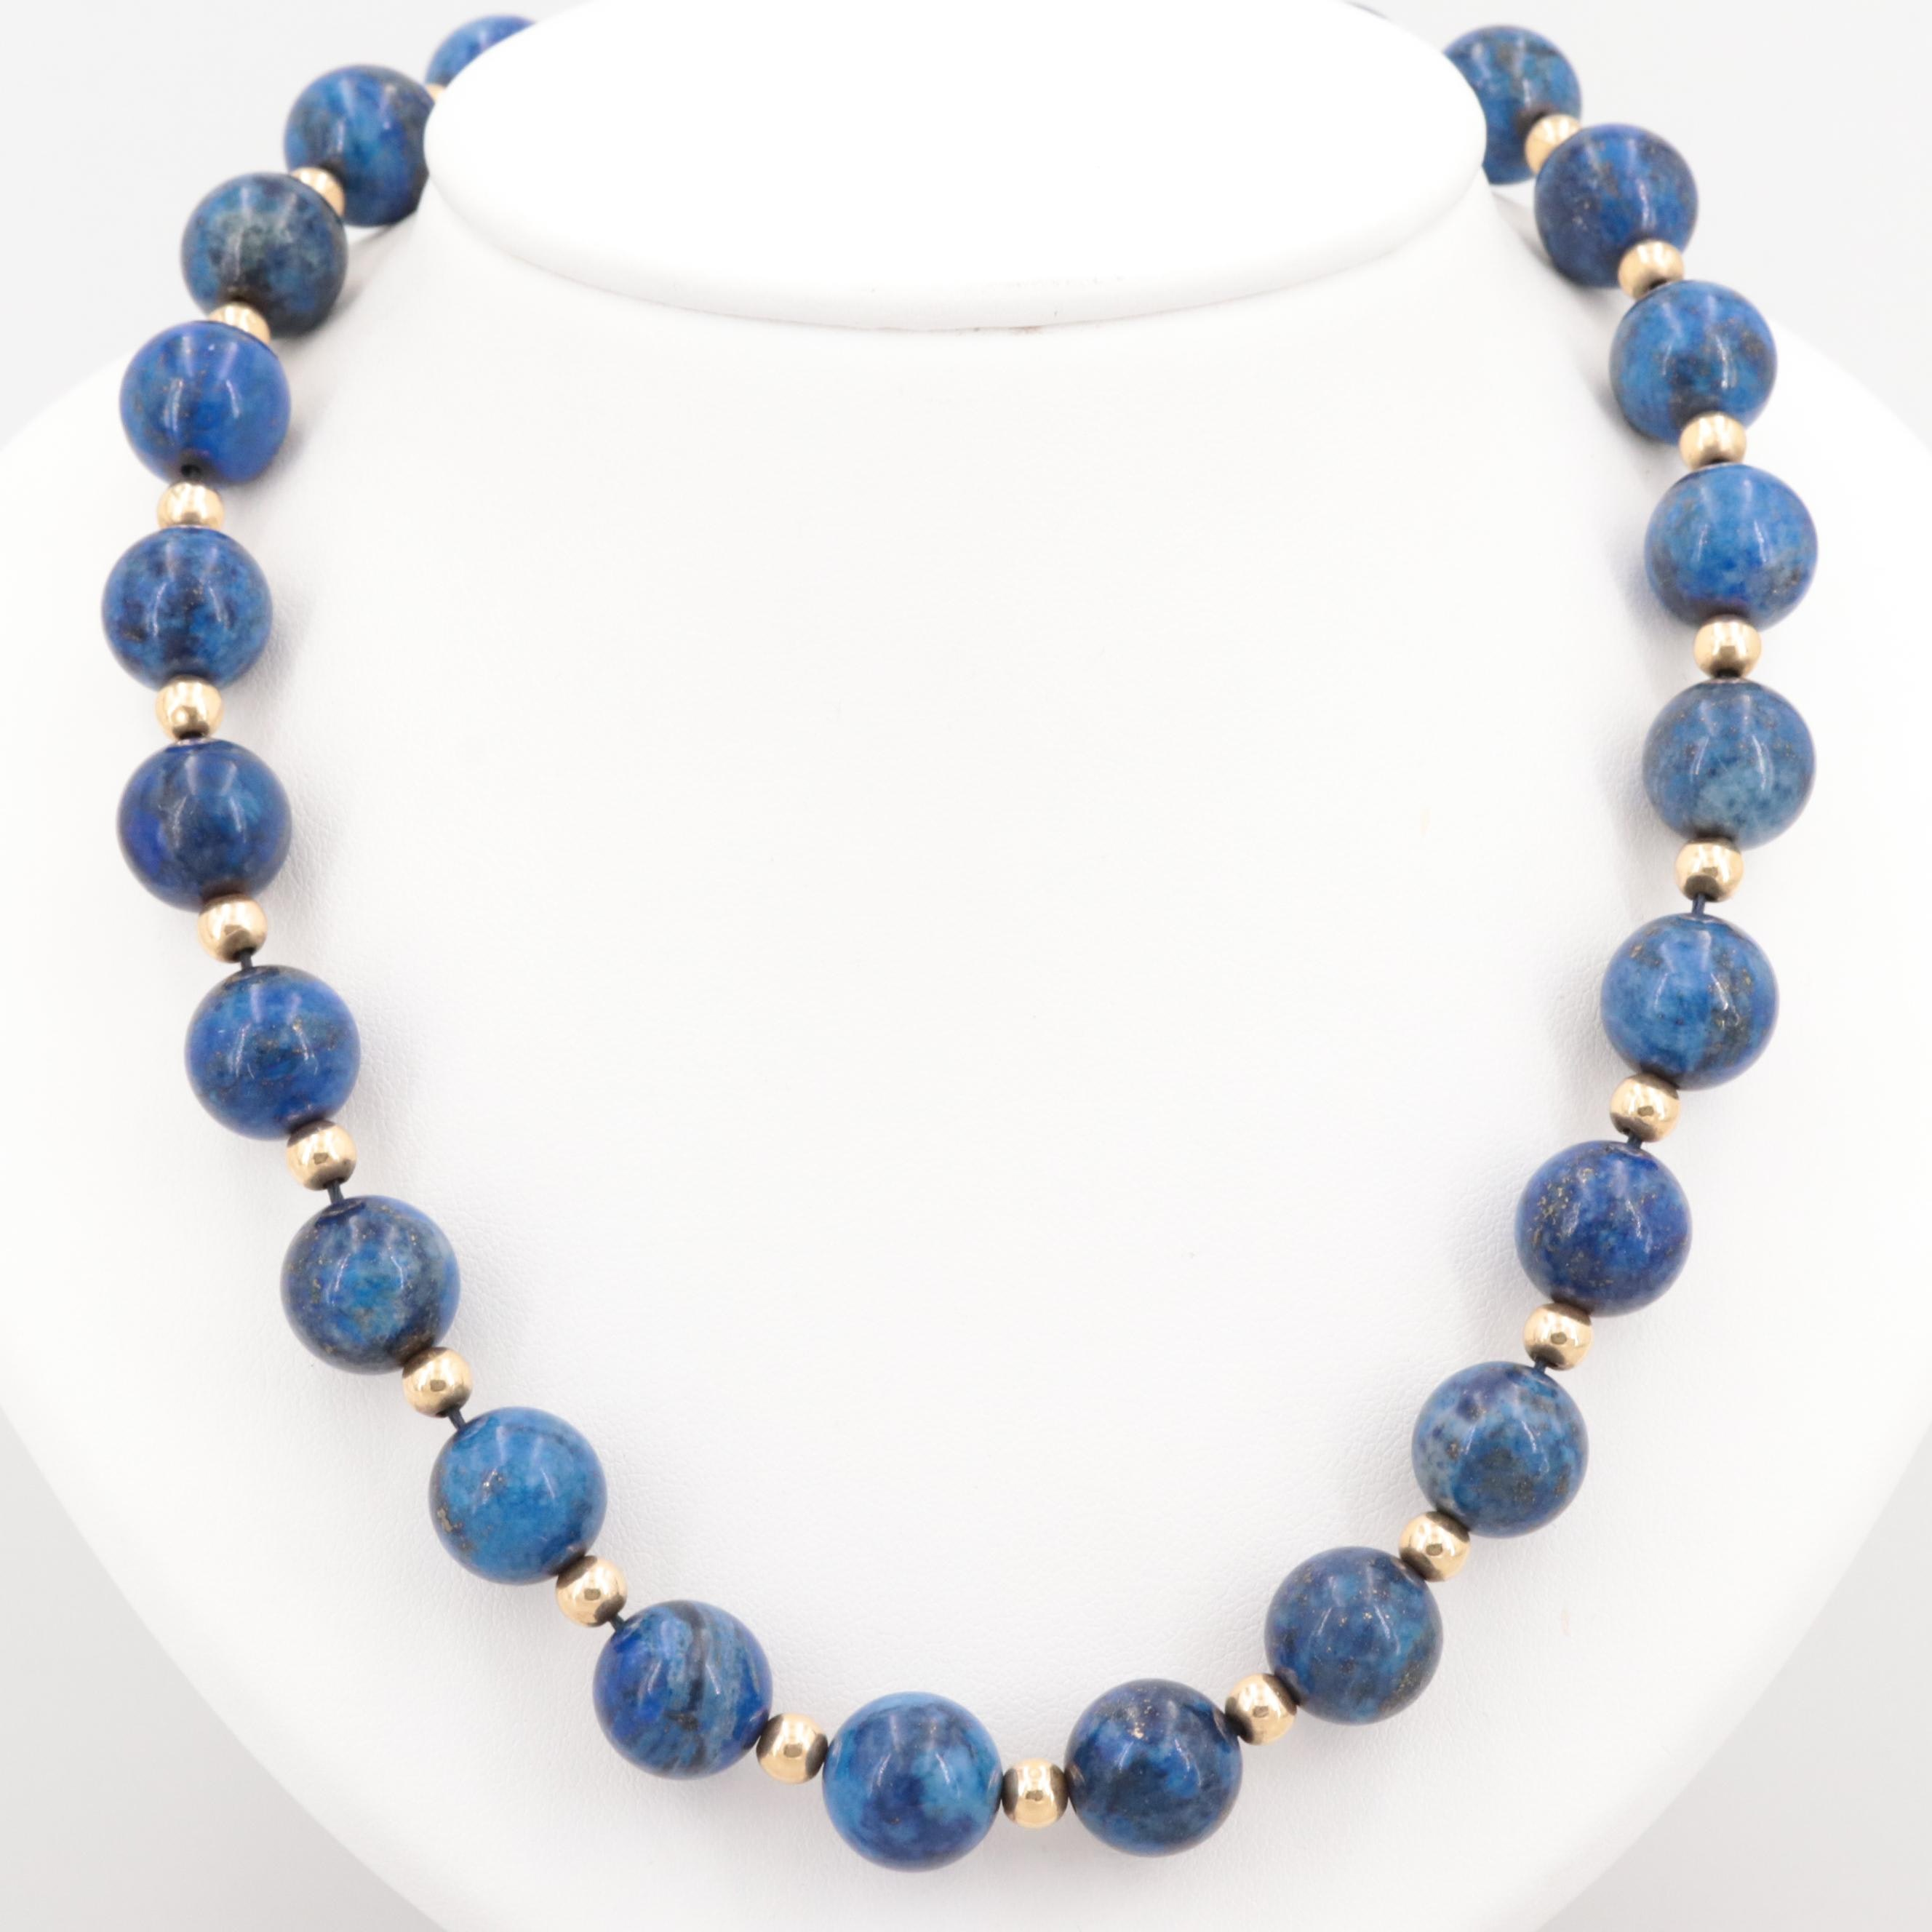 18K Yellow Gold Lapis Lazuli Beaded Necklace